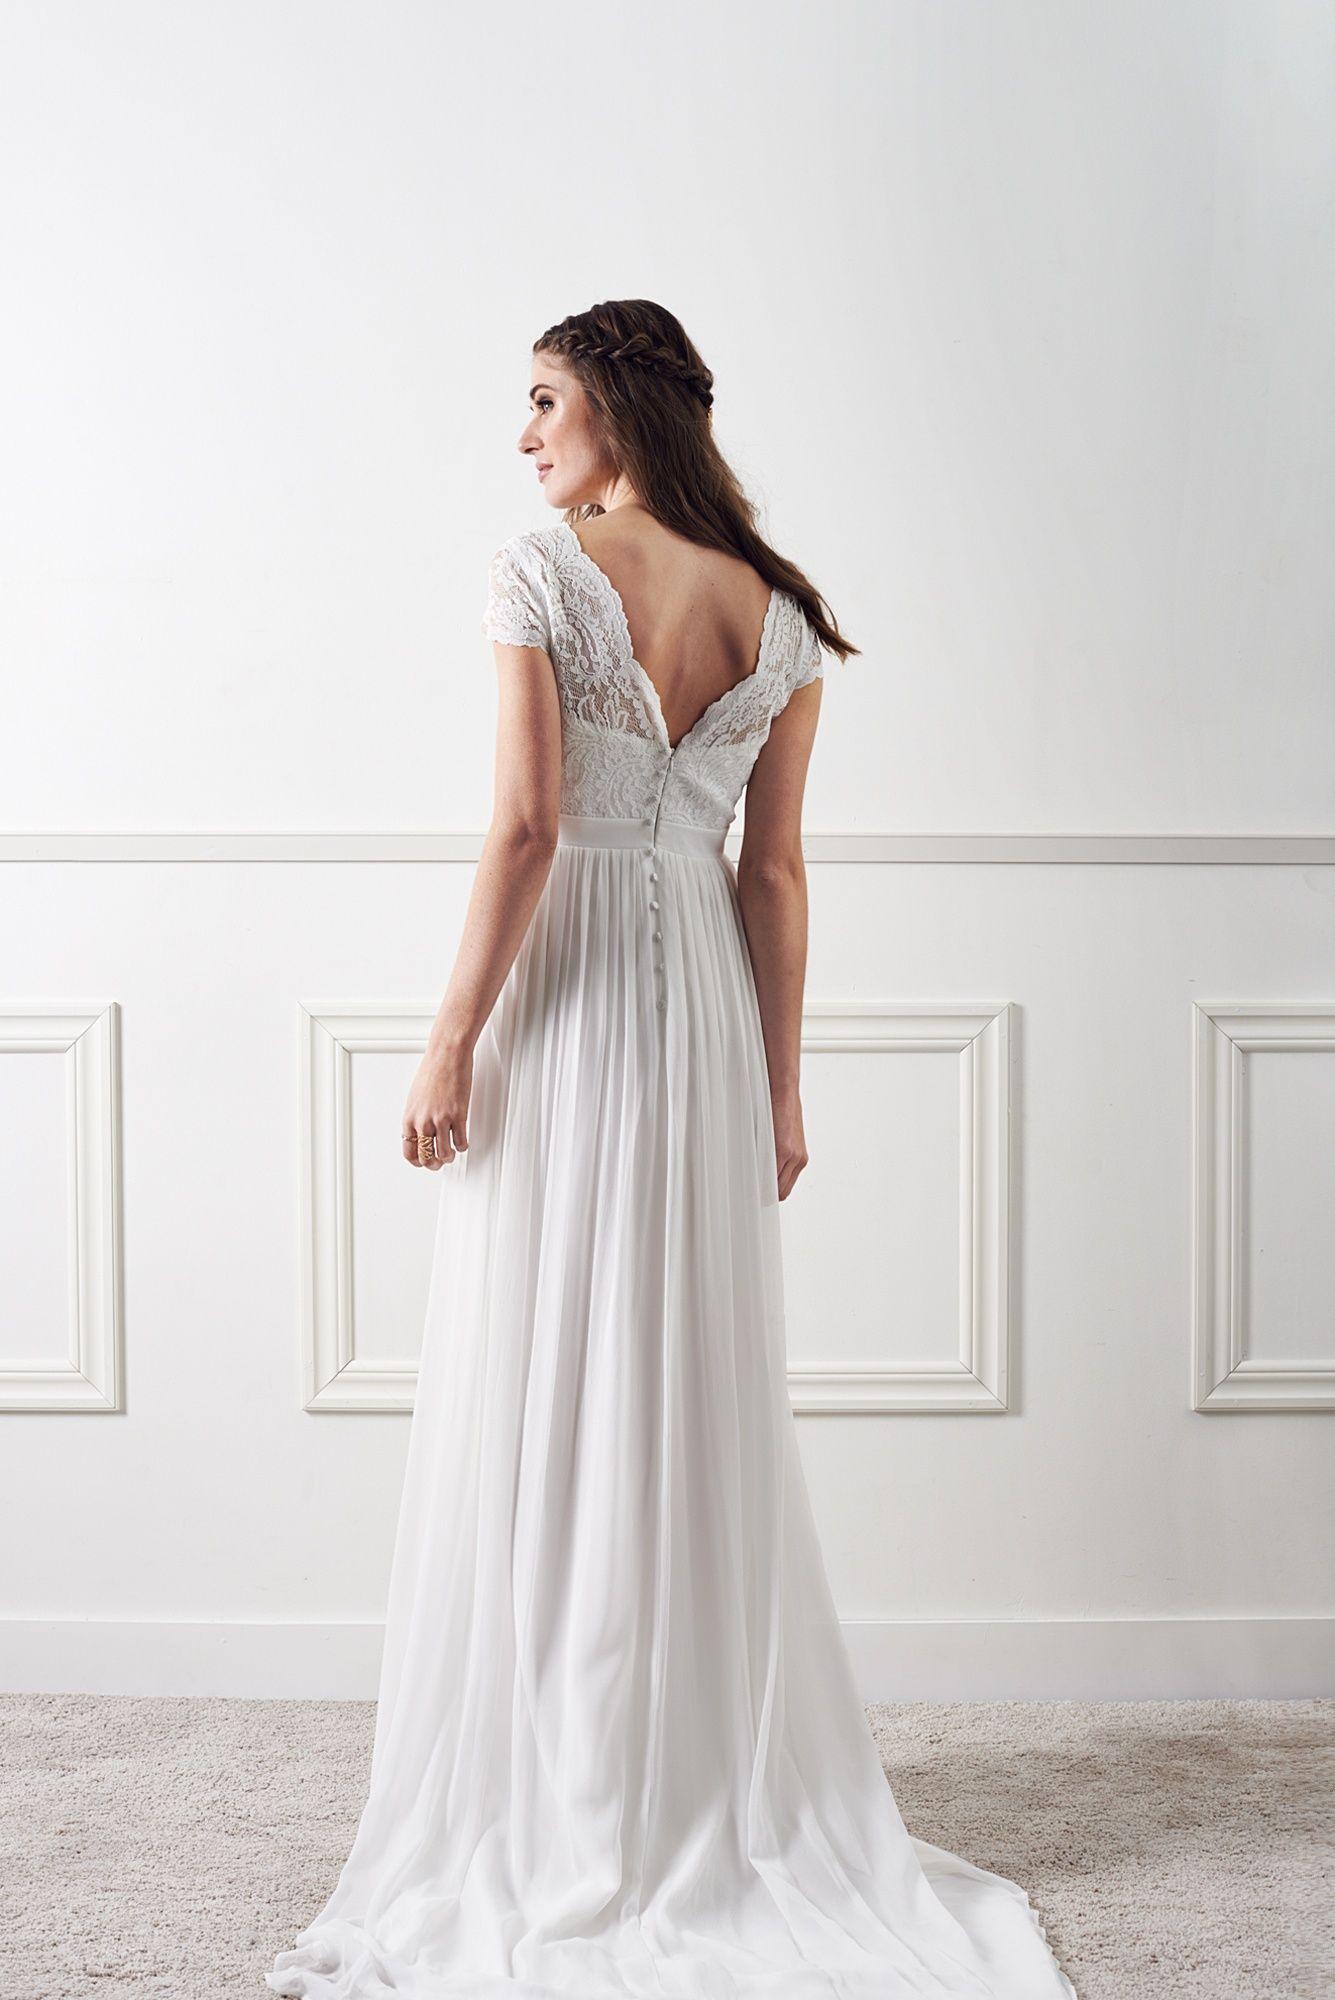 45_22aaeed059-lucina-white-dahlia-lace-3-big.jpg 1335 × 2000 pixlar